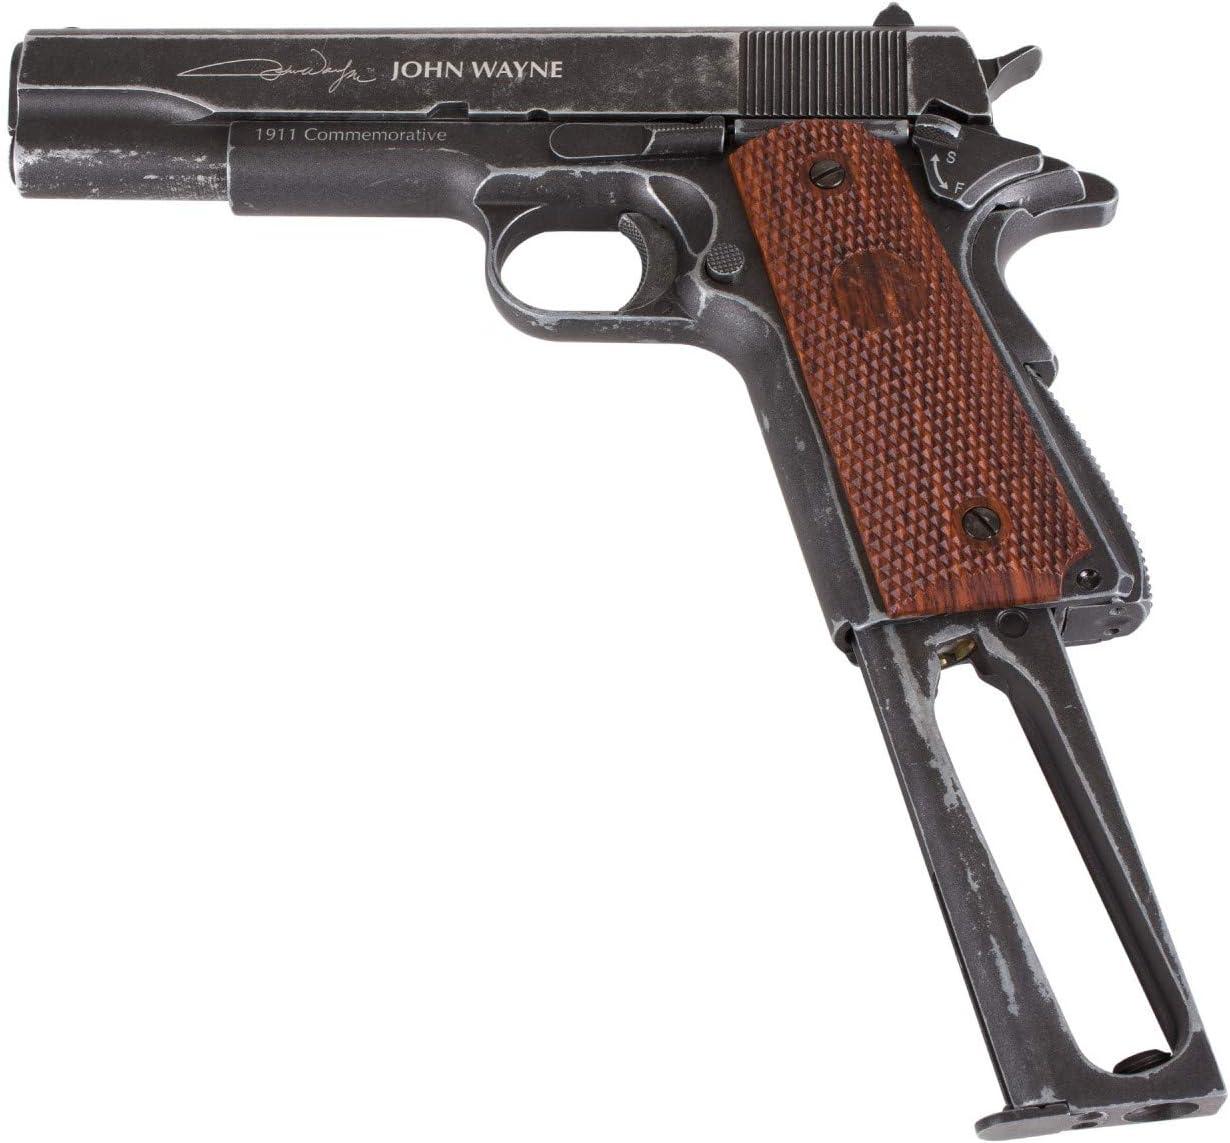 John Wayne 1911 Metal CO2 BB Pistol, Brown Grips air Pistol : Sports & Outdoors